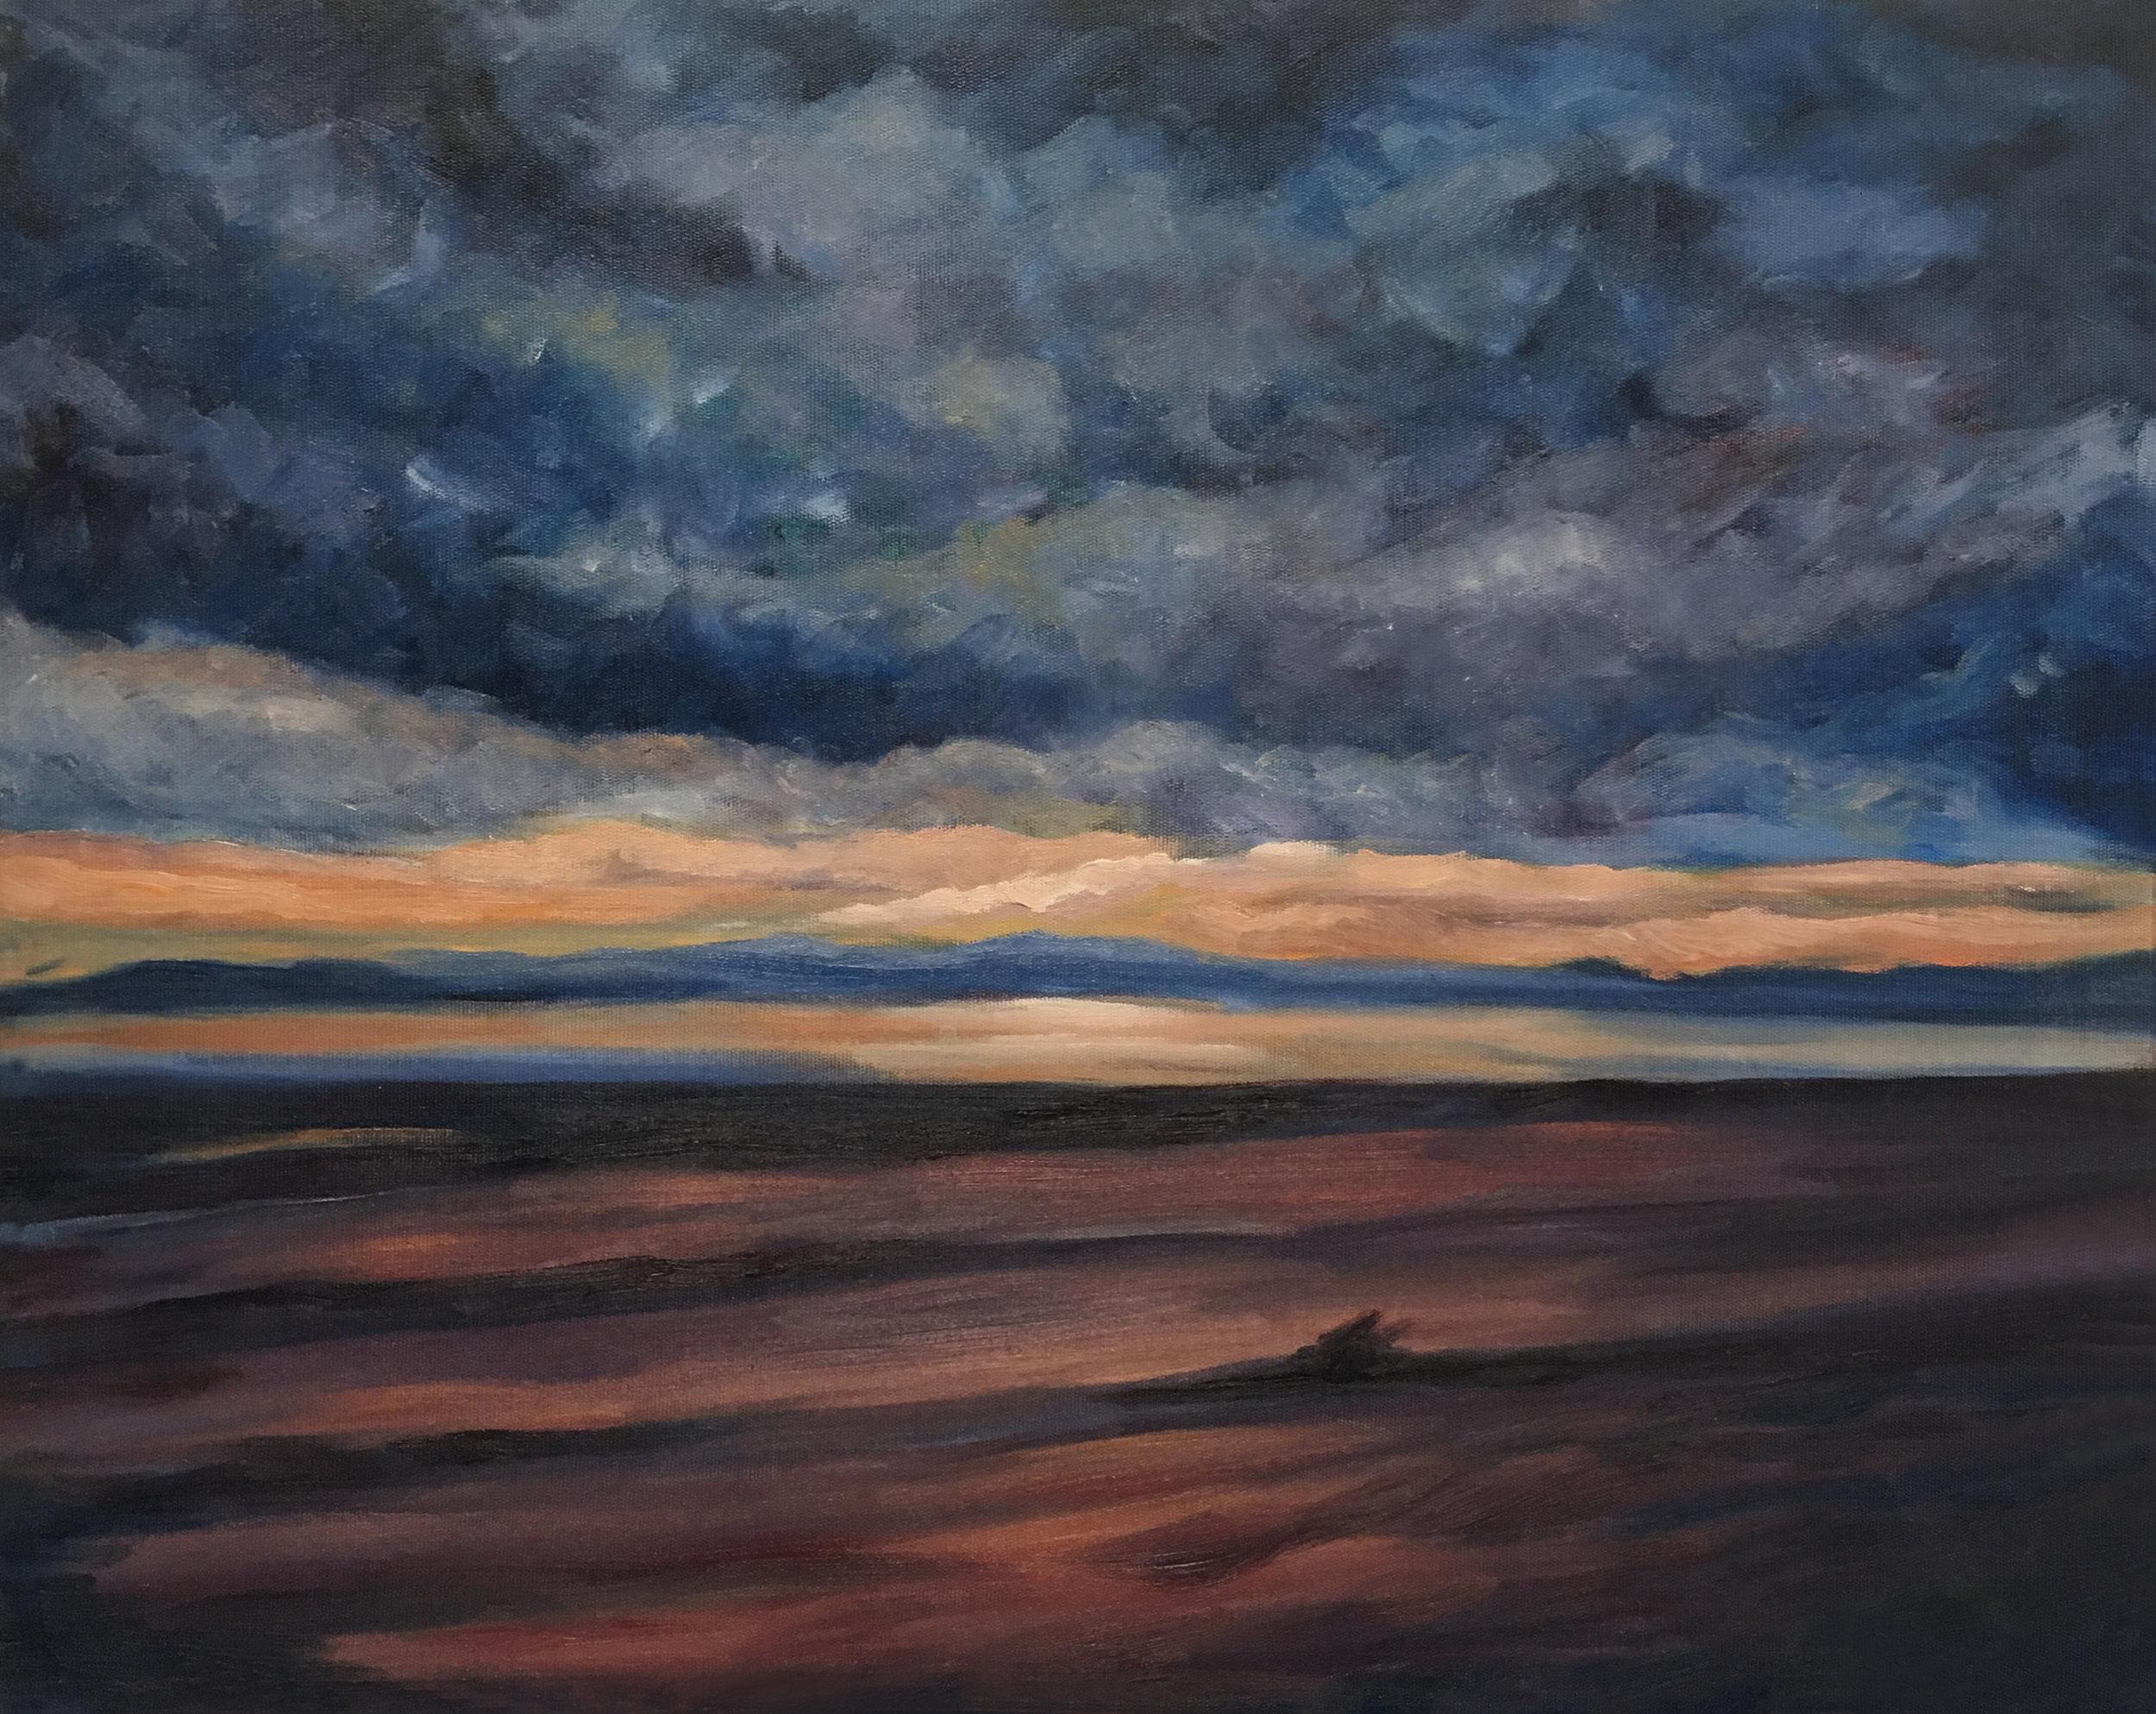 El Golfo Evening  16x20  Oil on Canvas